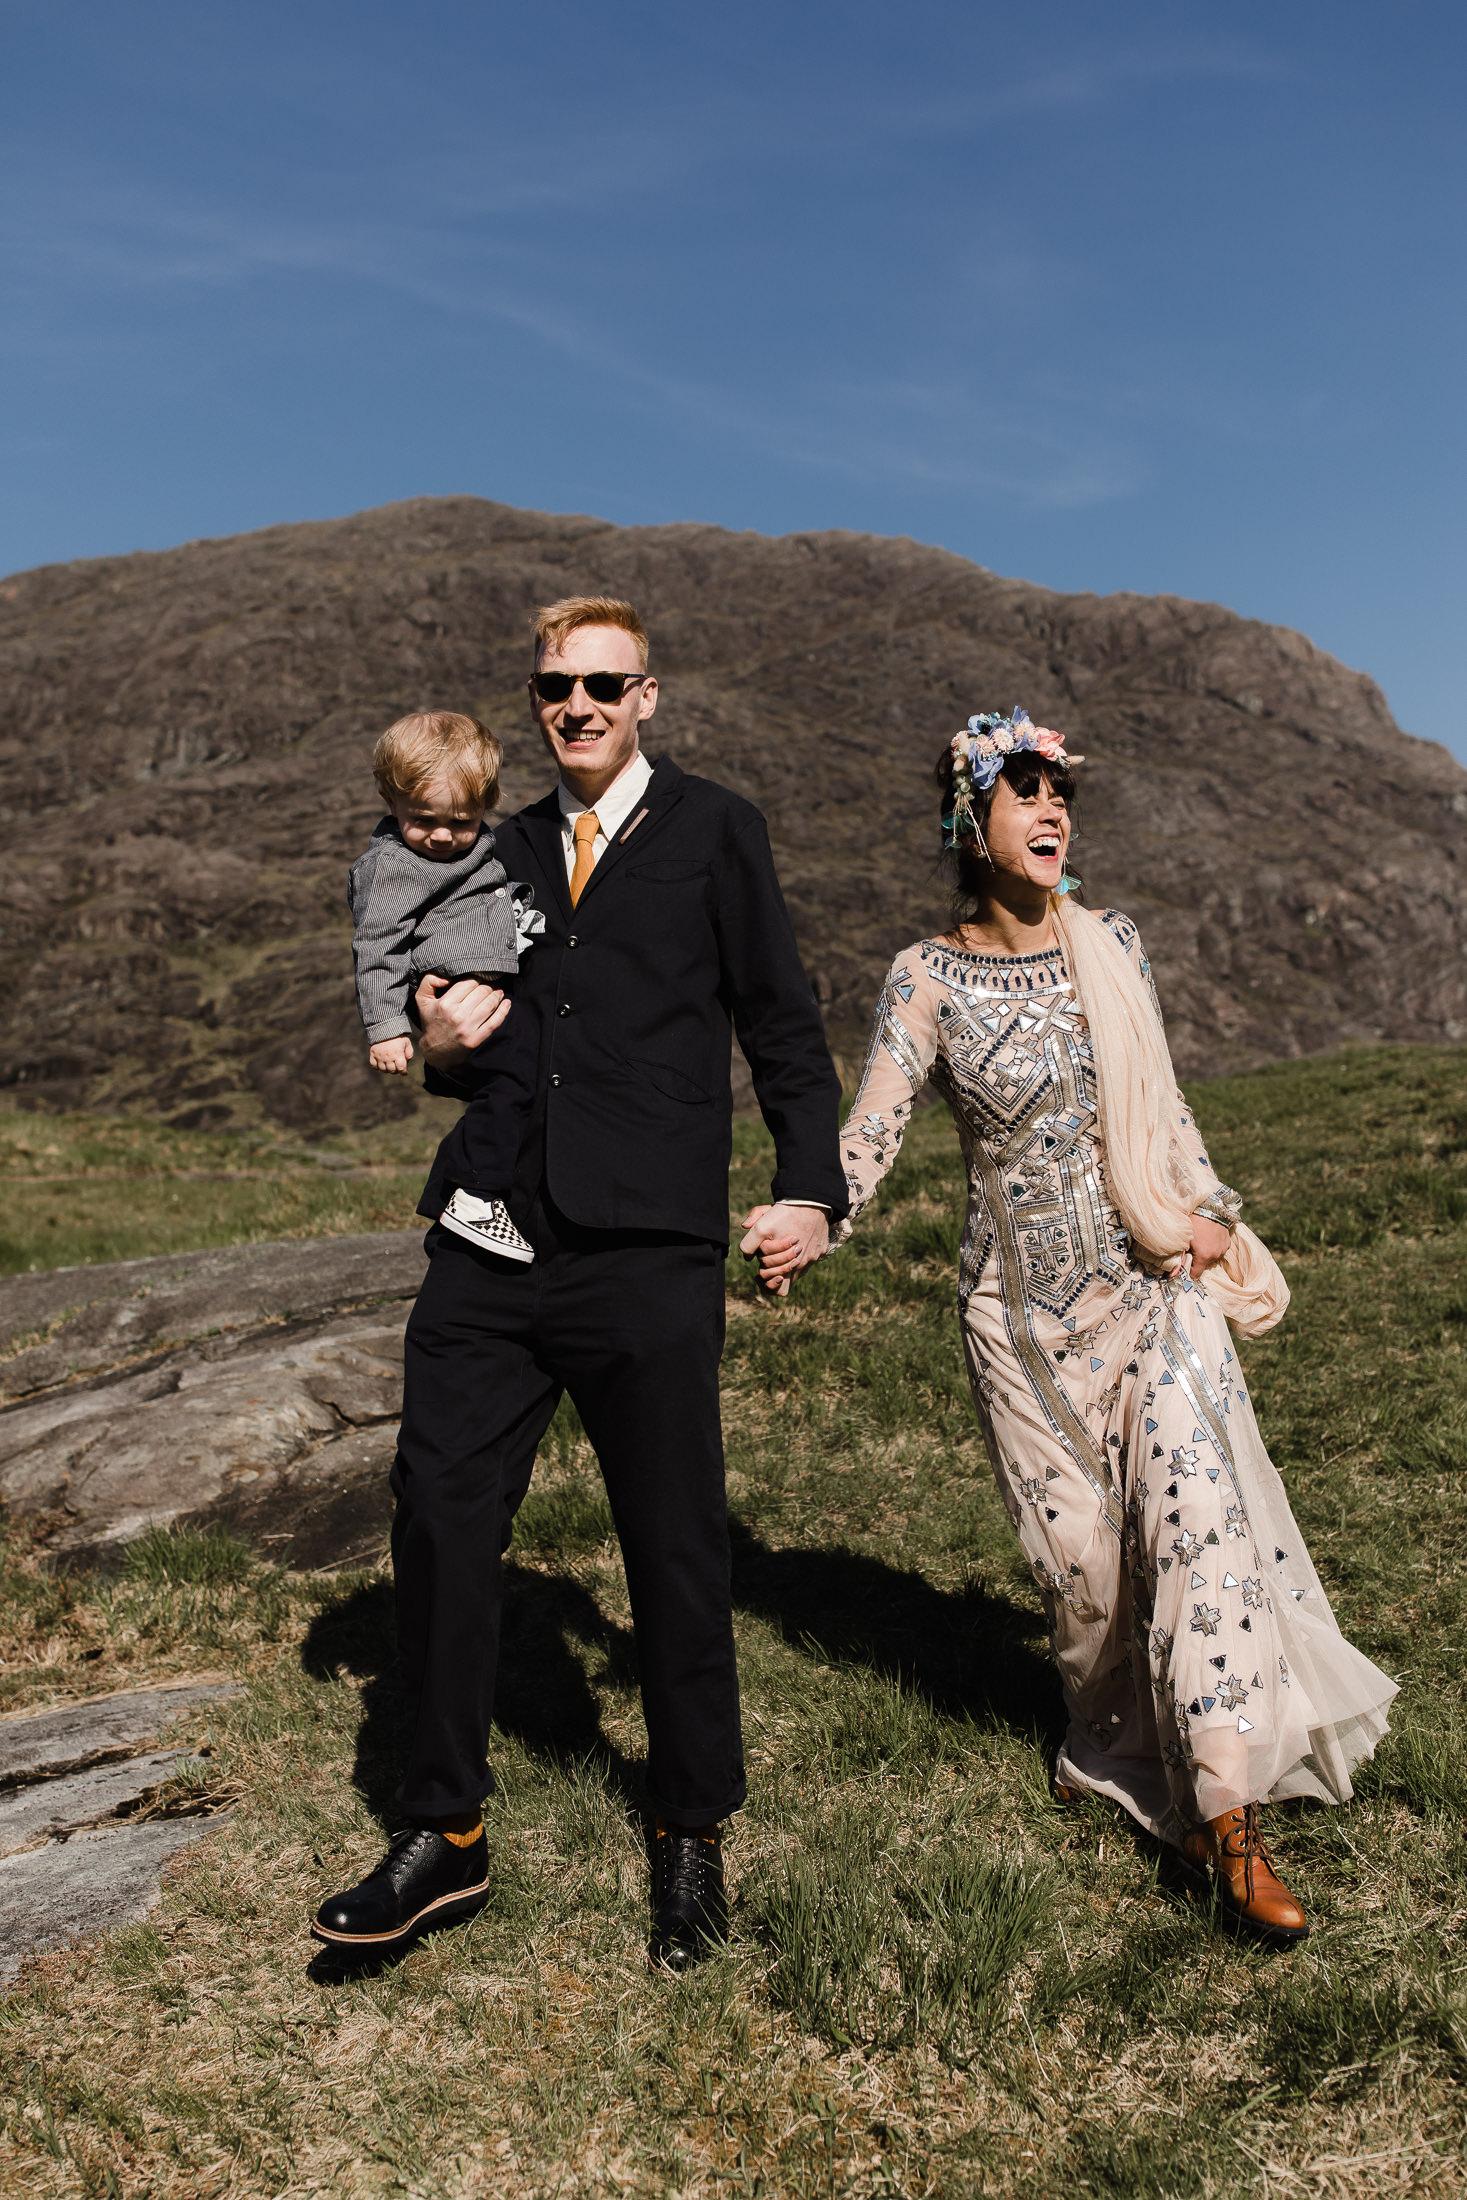 Loch_Coruisk_Isle_Skye_Wedding_Skeabost_A-M_Munky_299.jpg